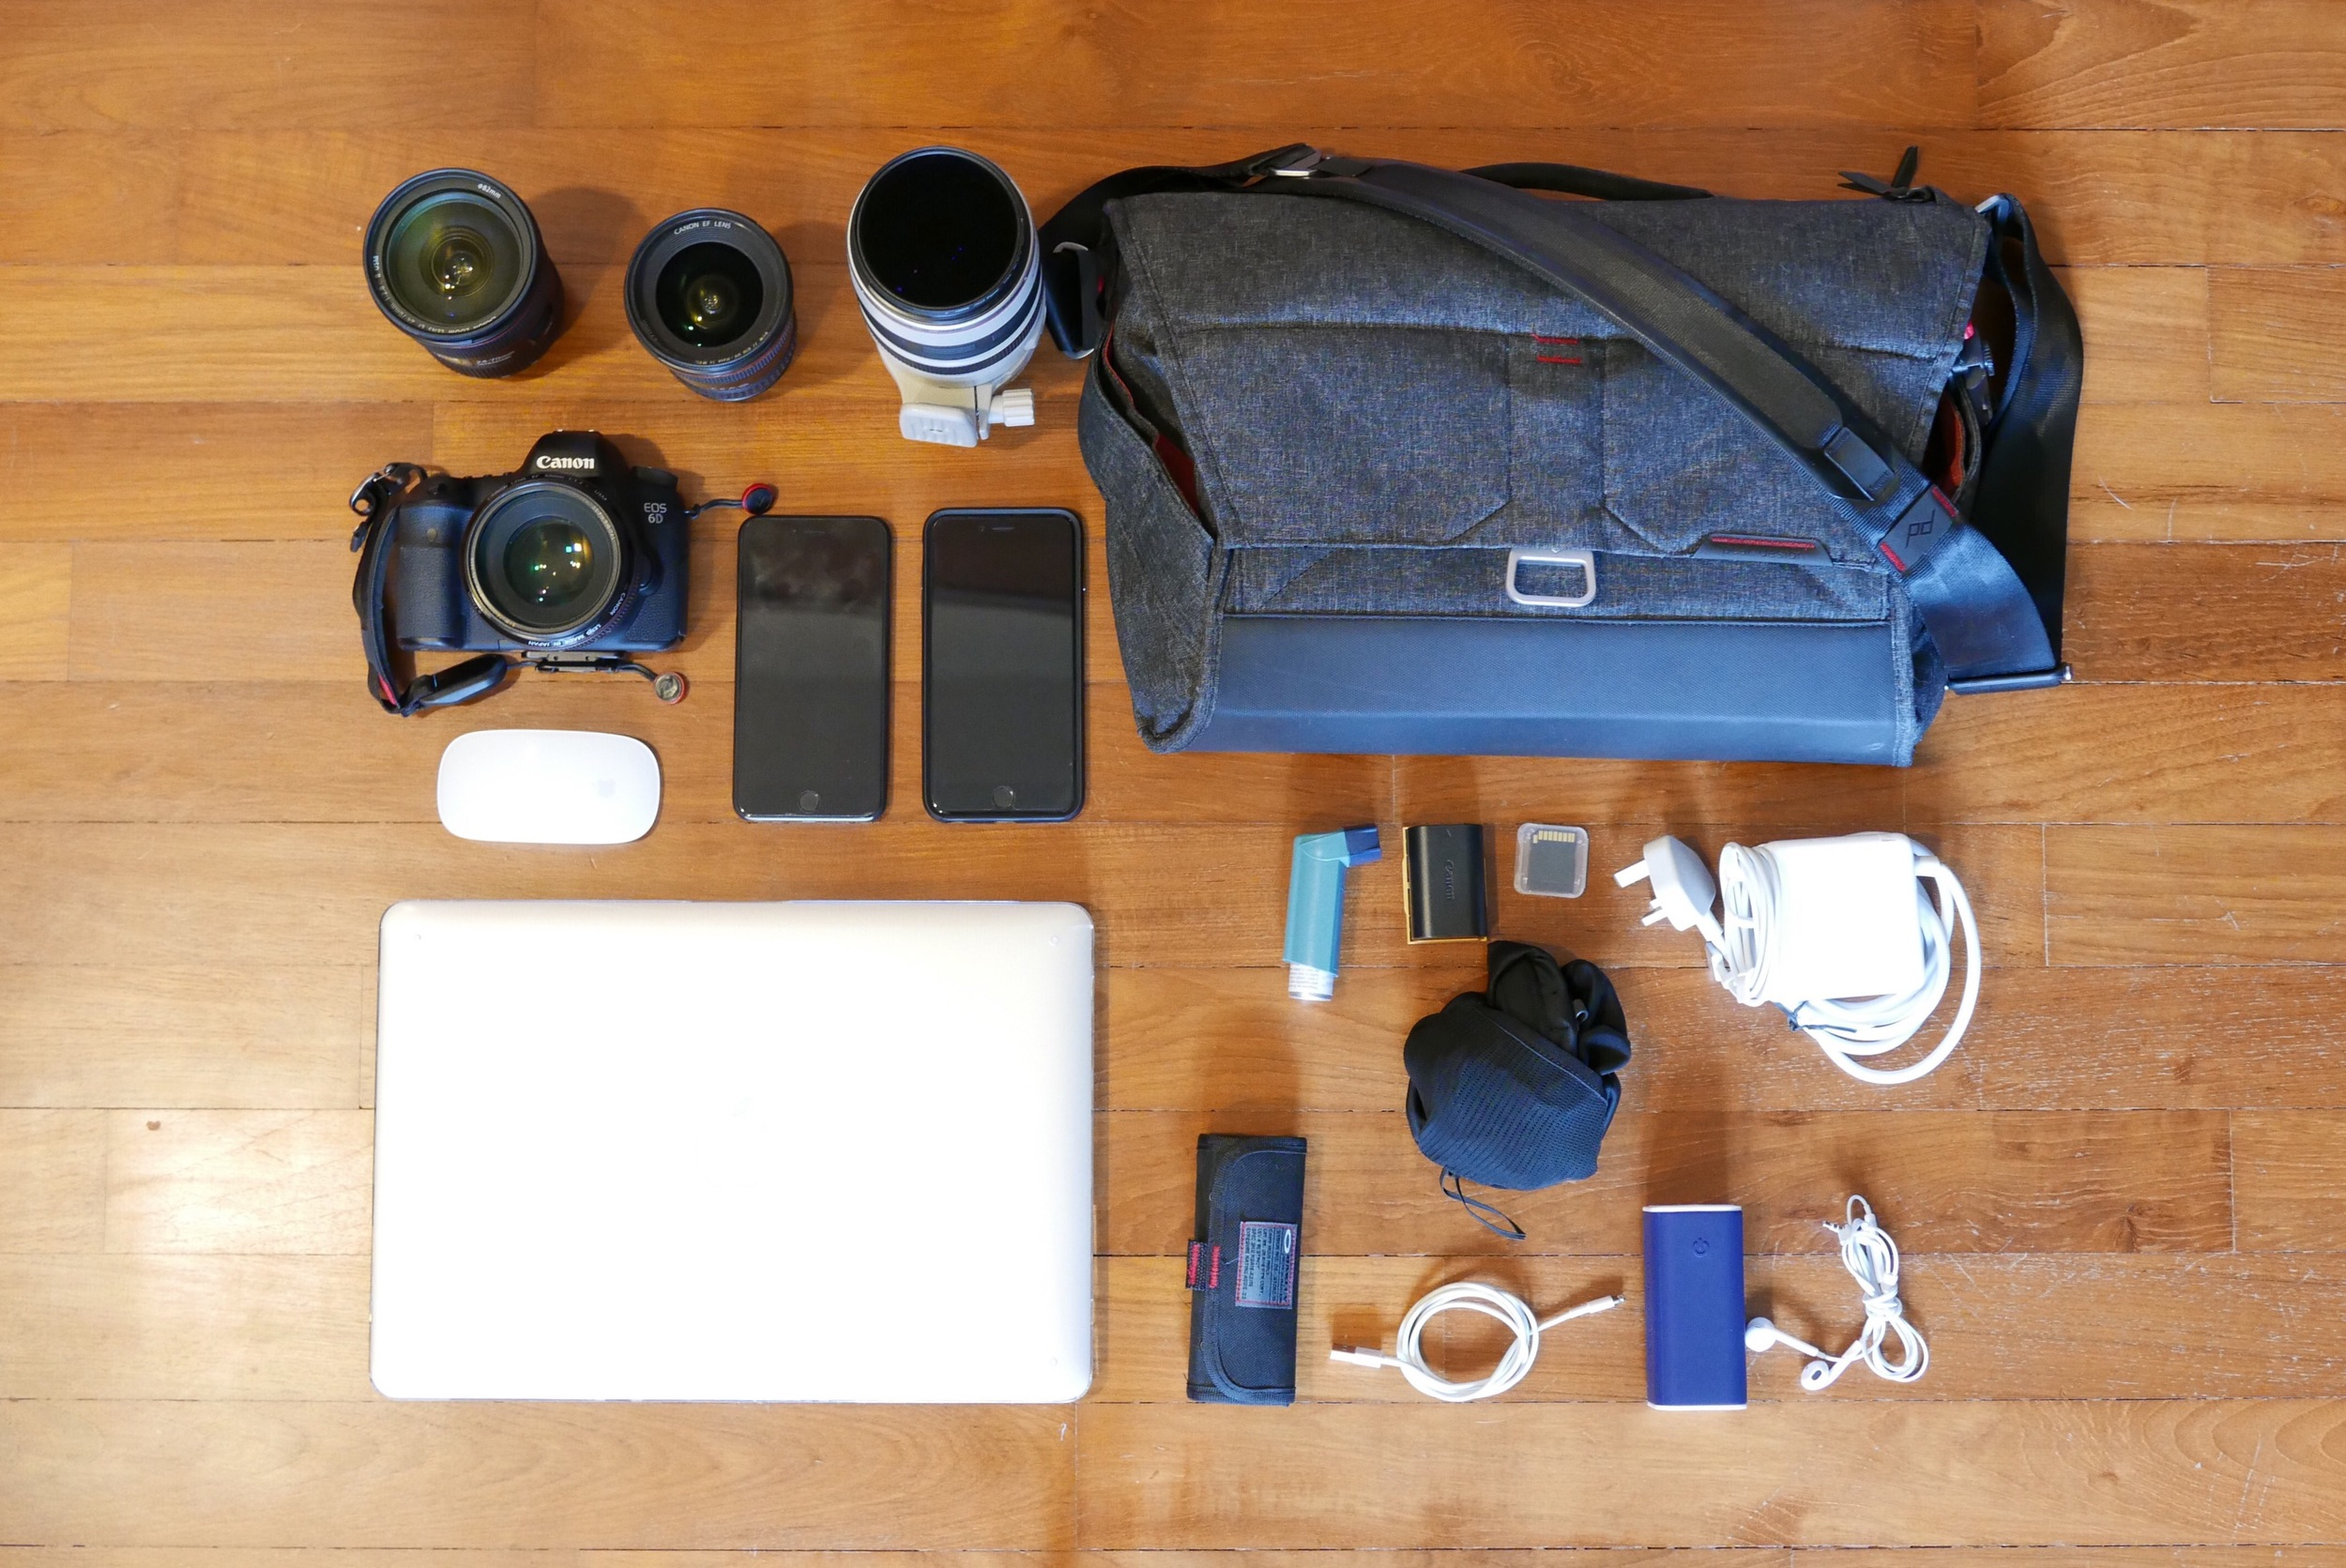 "Canon 6D,17-40mm F4 L,24-70mm F2.8 L II,50mm F1.2 L,100-400mm F3.5-5.6 L,The Everyday Messenger Bag by Peak Design,iPhone 6 Plus & 6s Plus,15"" MacBook Pro Retina and various little knick knacks..."